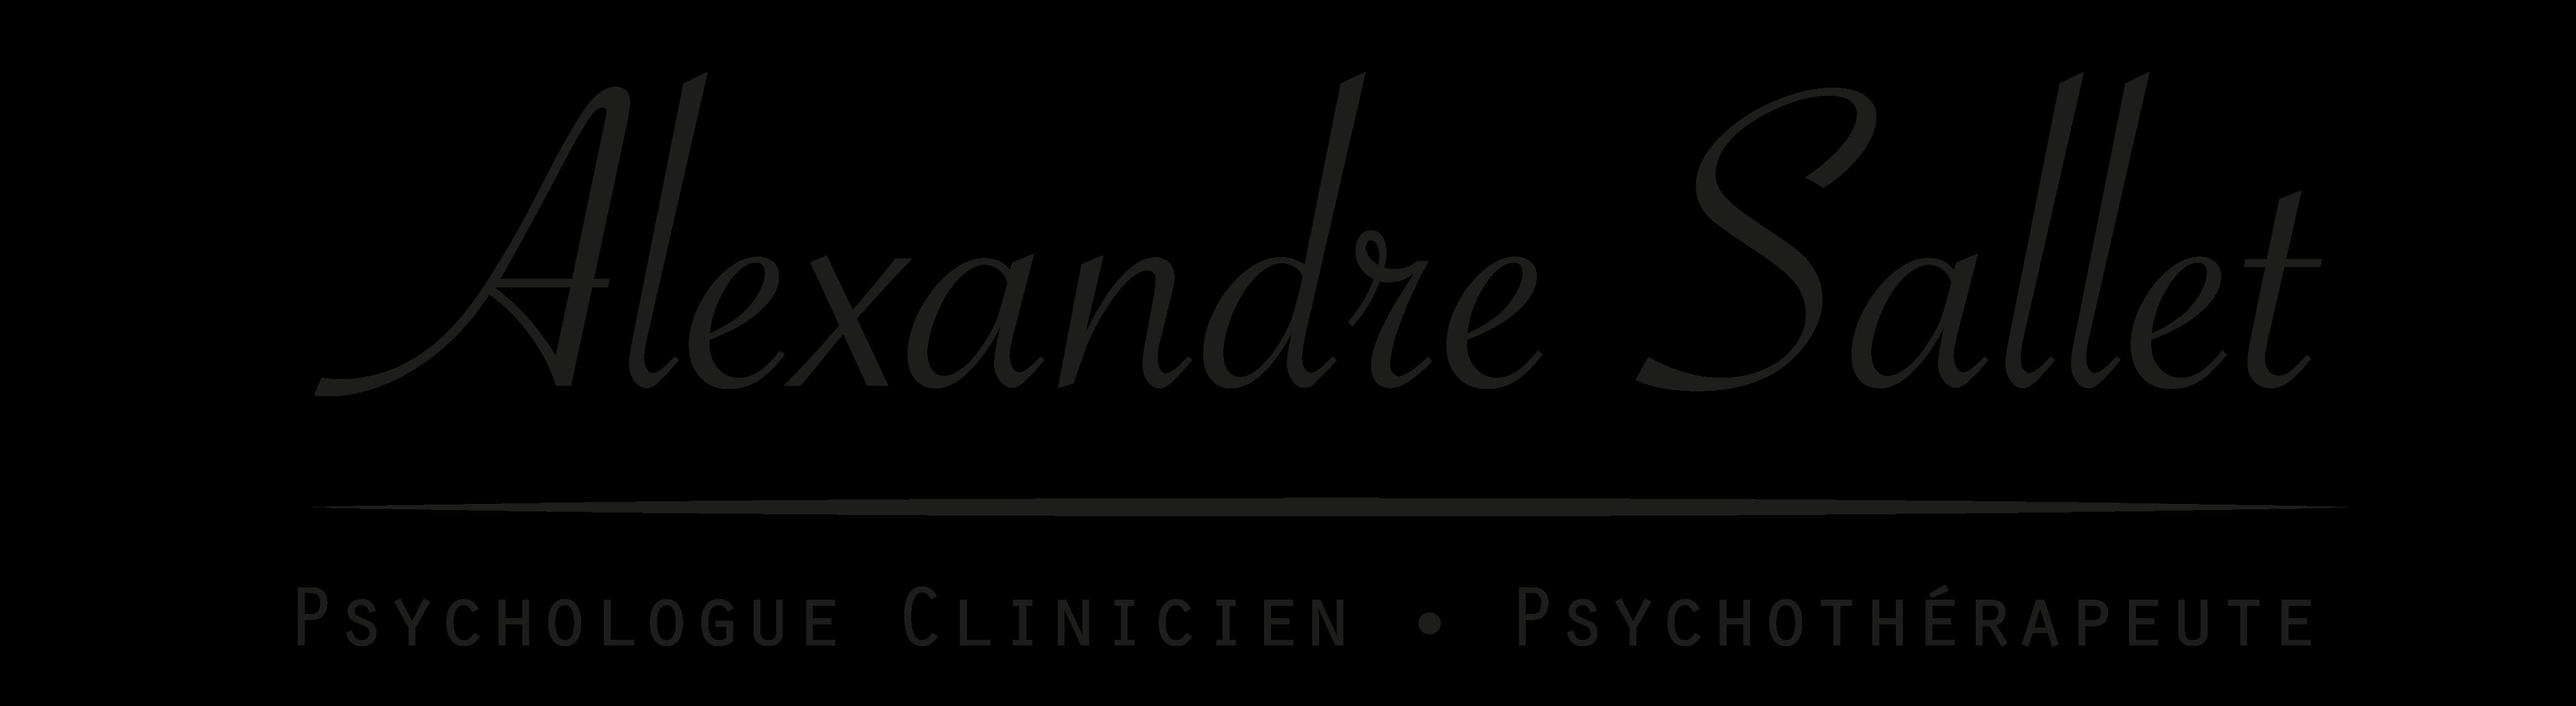 Alexandre Sallet